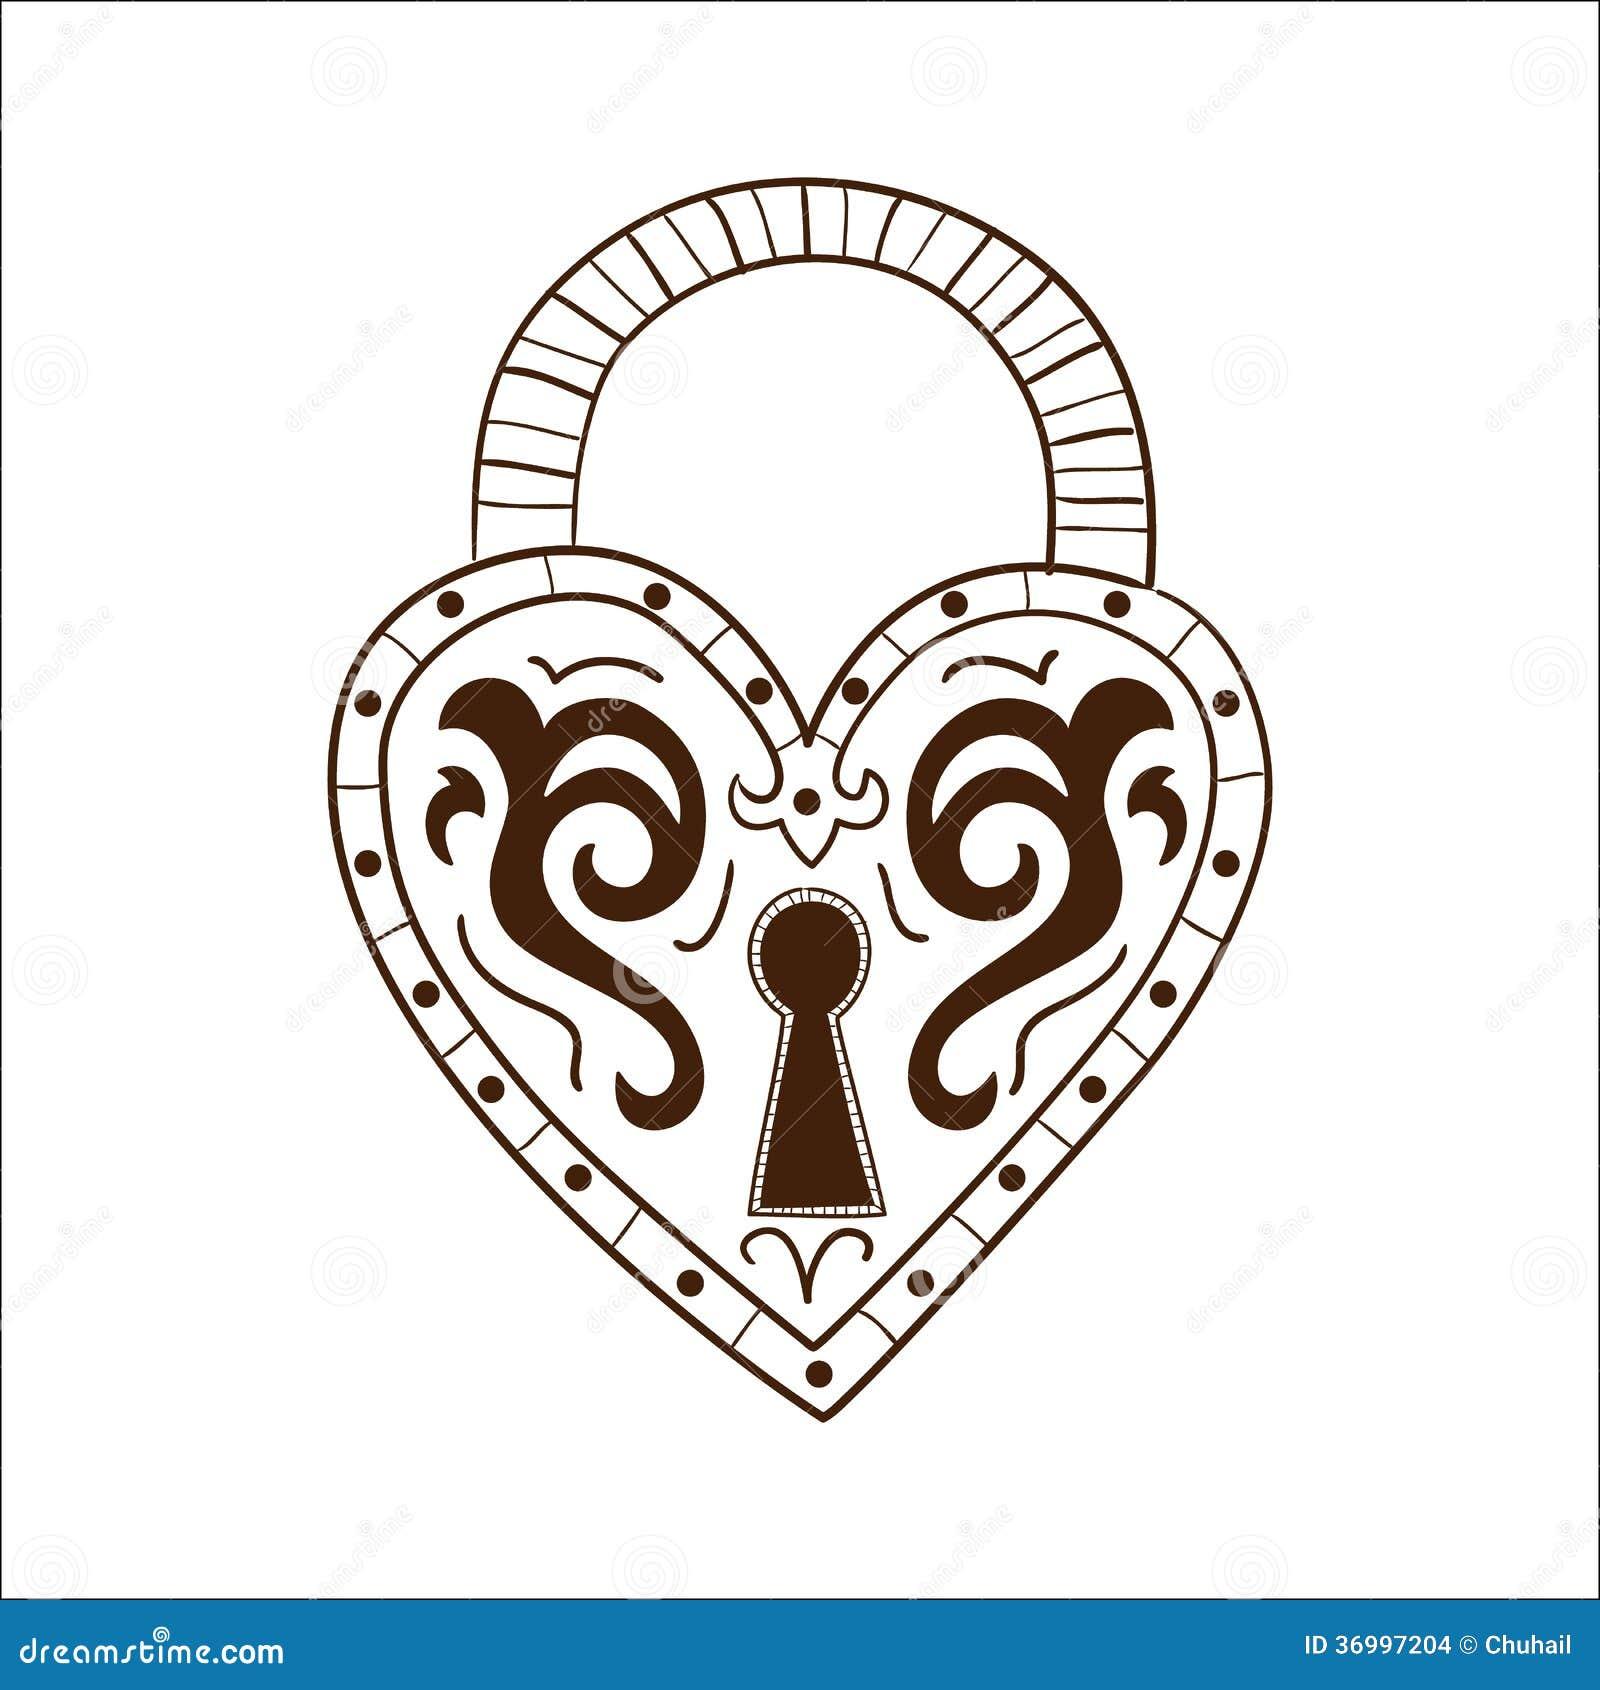 Heart Lock Isolated On White. Stock Images - Image: 36997204